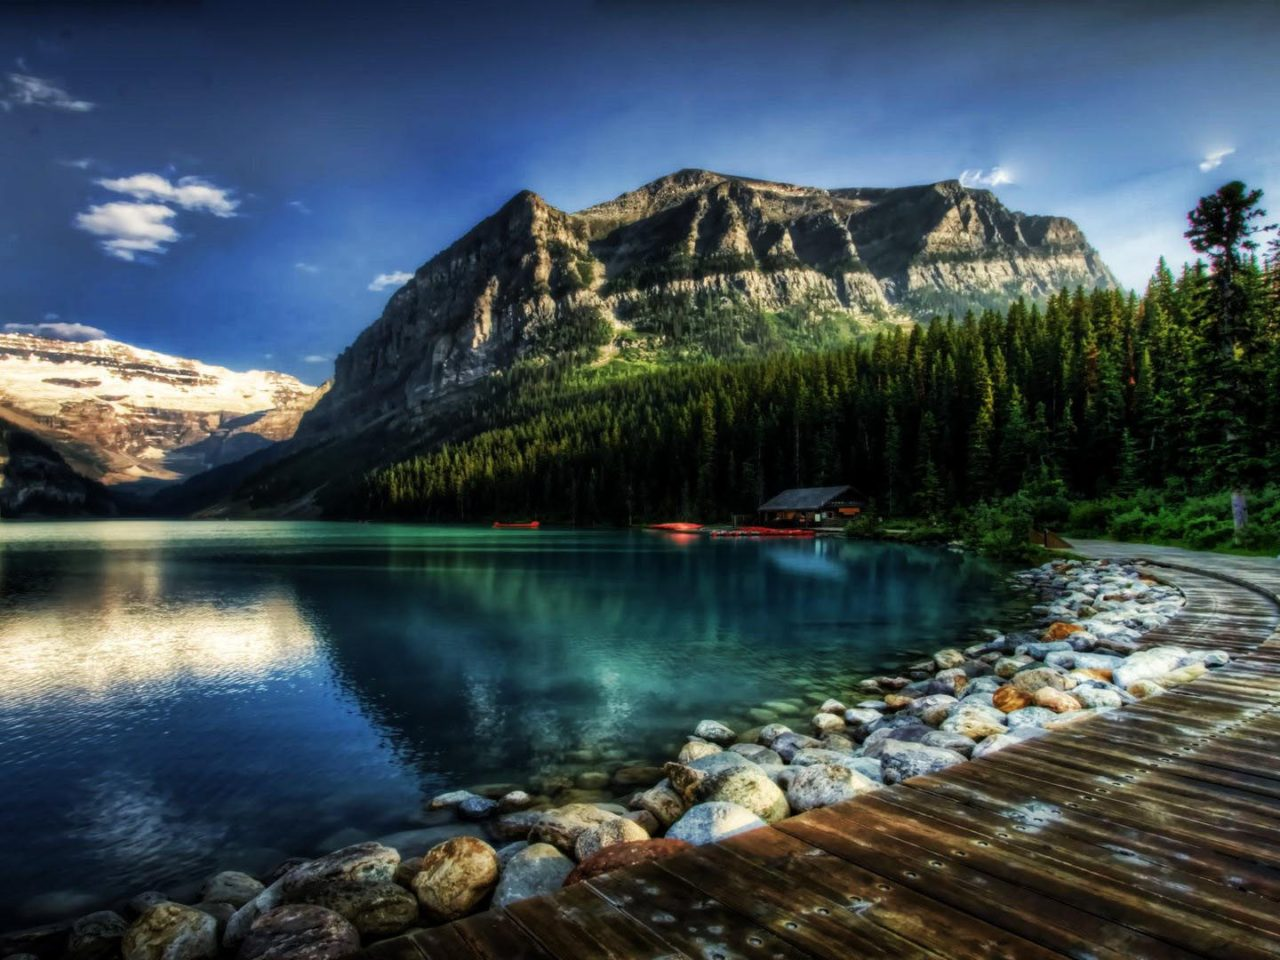 Fall Beach Wallpaper Lake Louise Alberta Canada Fantastic Desktop Wallpaper